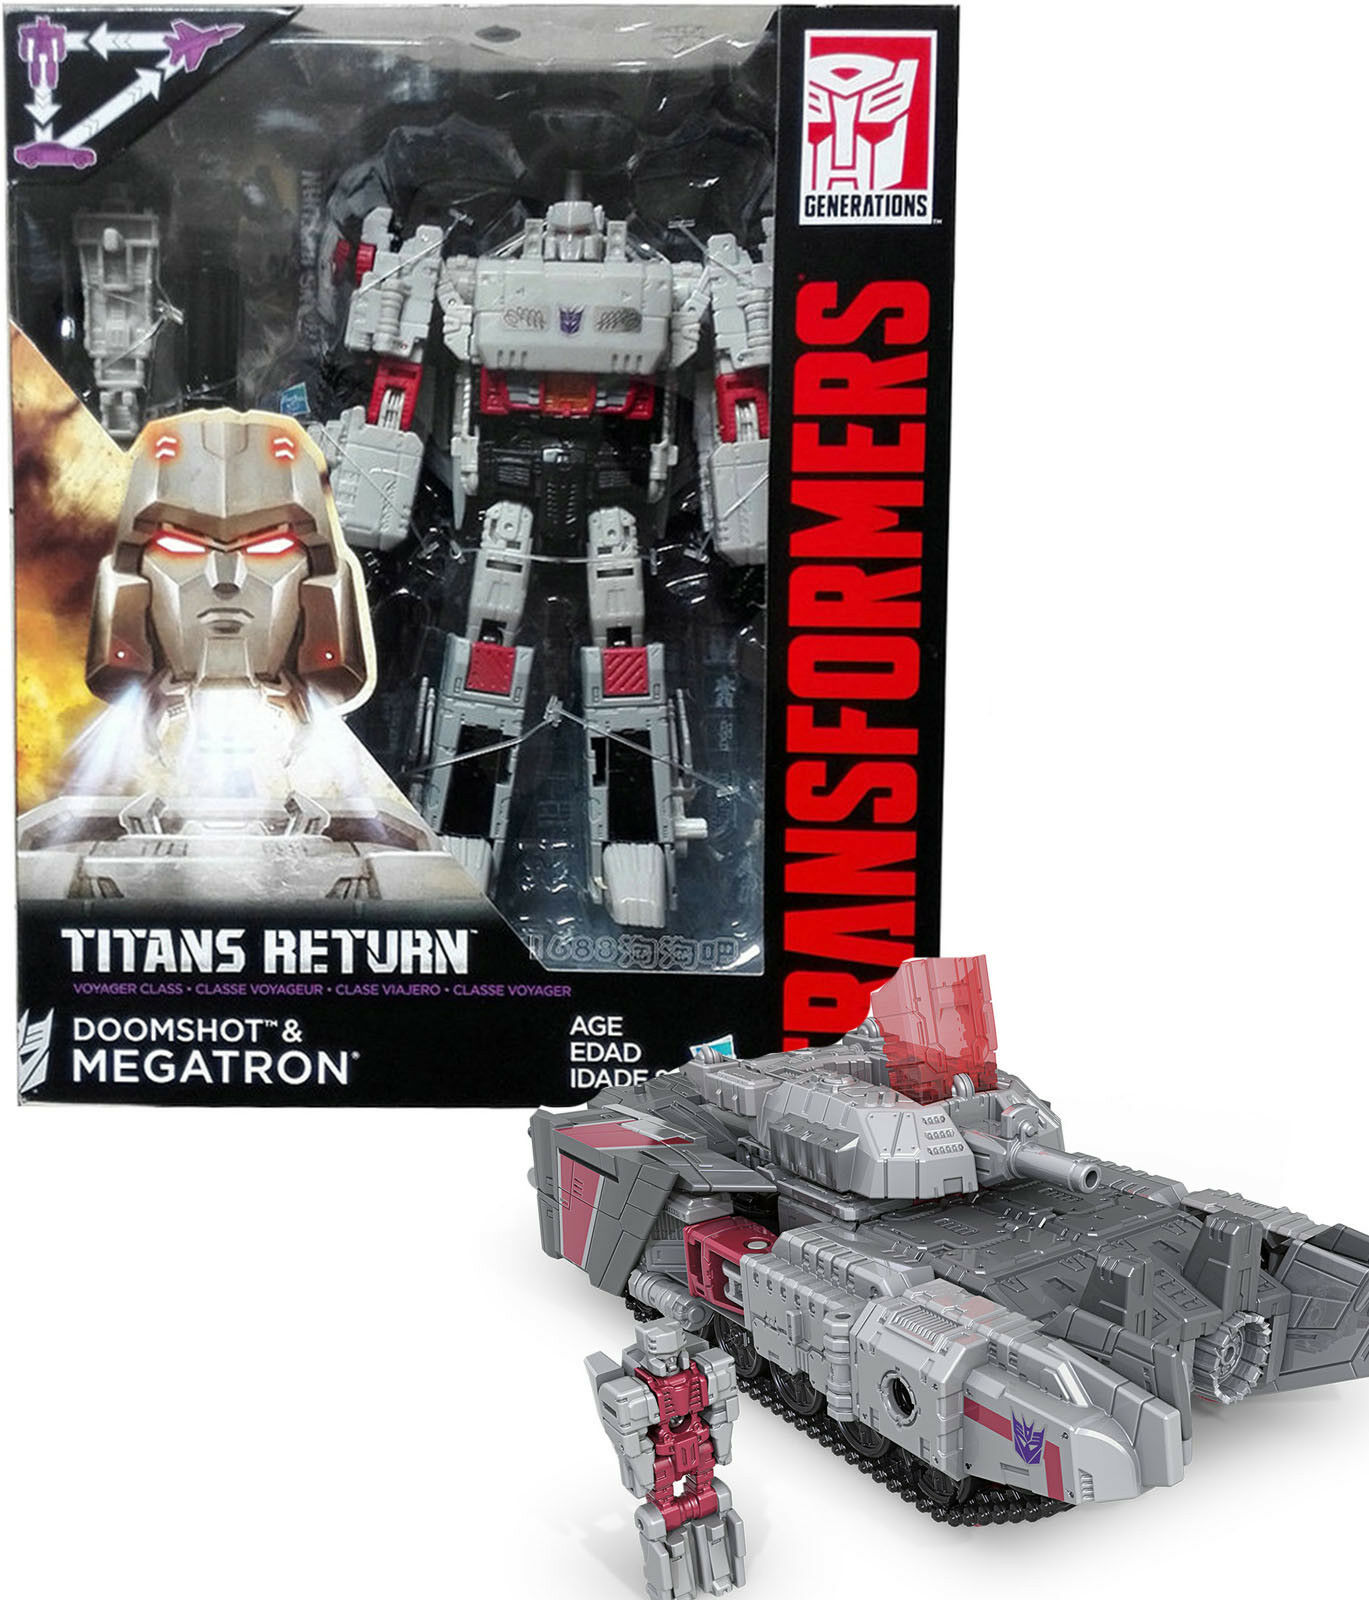 Transformers Generations Titans Return DOOMSHOT & MEGATRON Voyager Class Gift